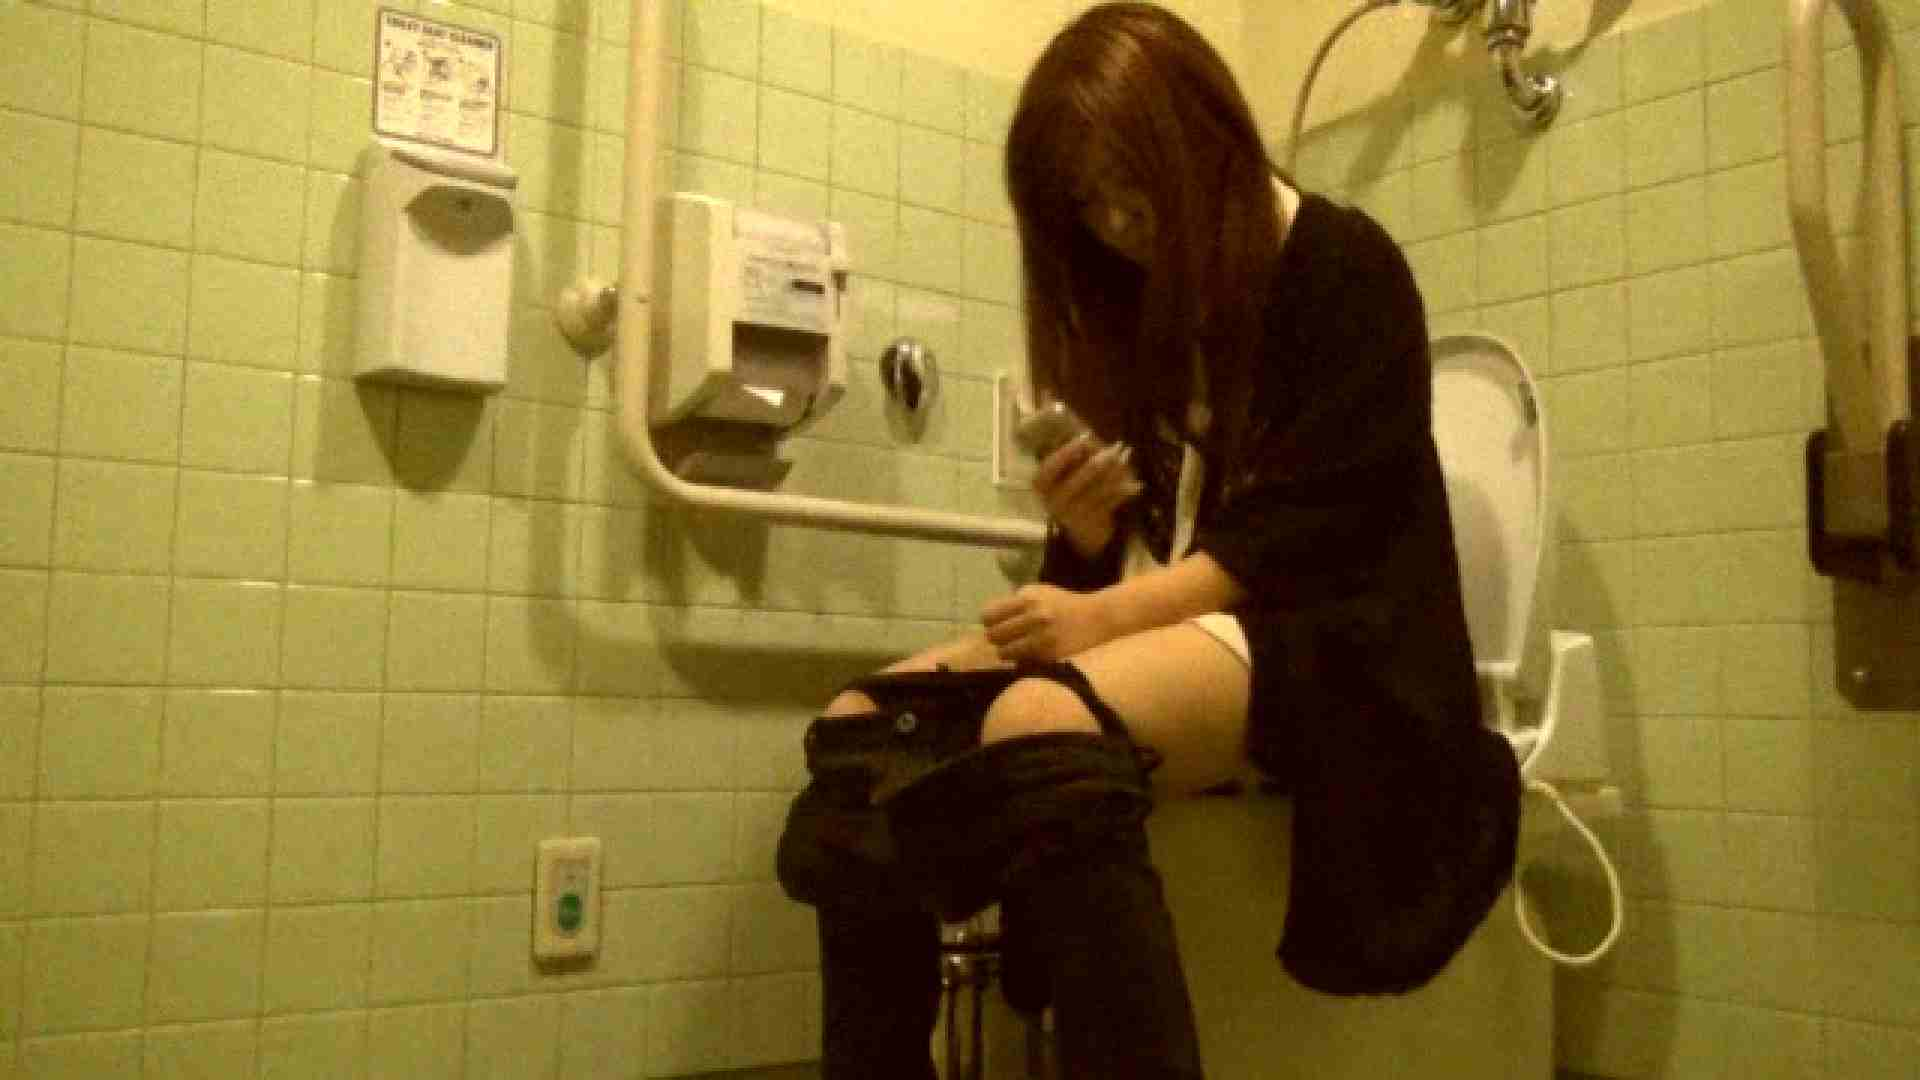 vol.26 【SKちゃん(洗面所)】ガールズバー店員 19歳 キャバ嬢  72PIX 63